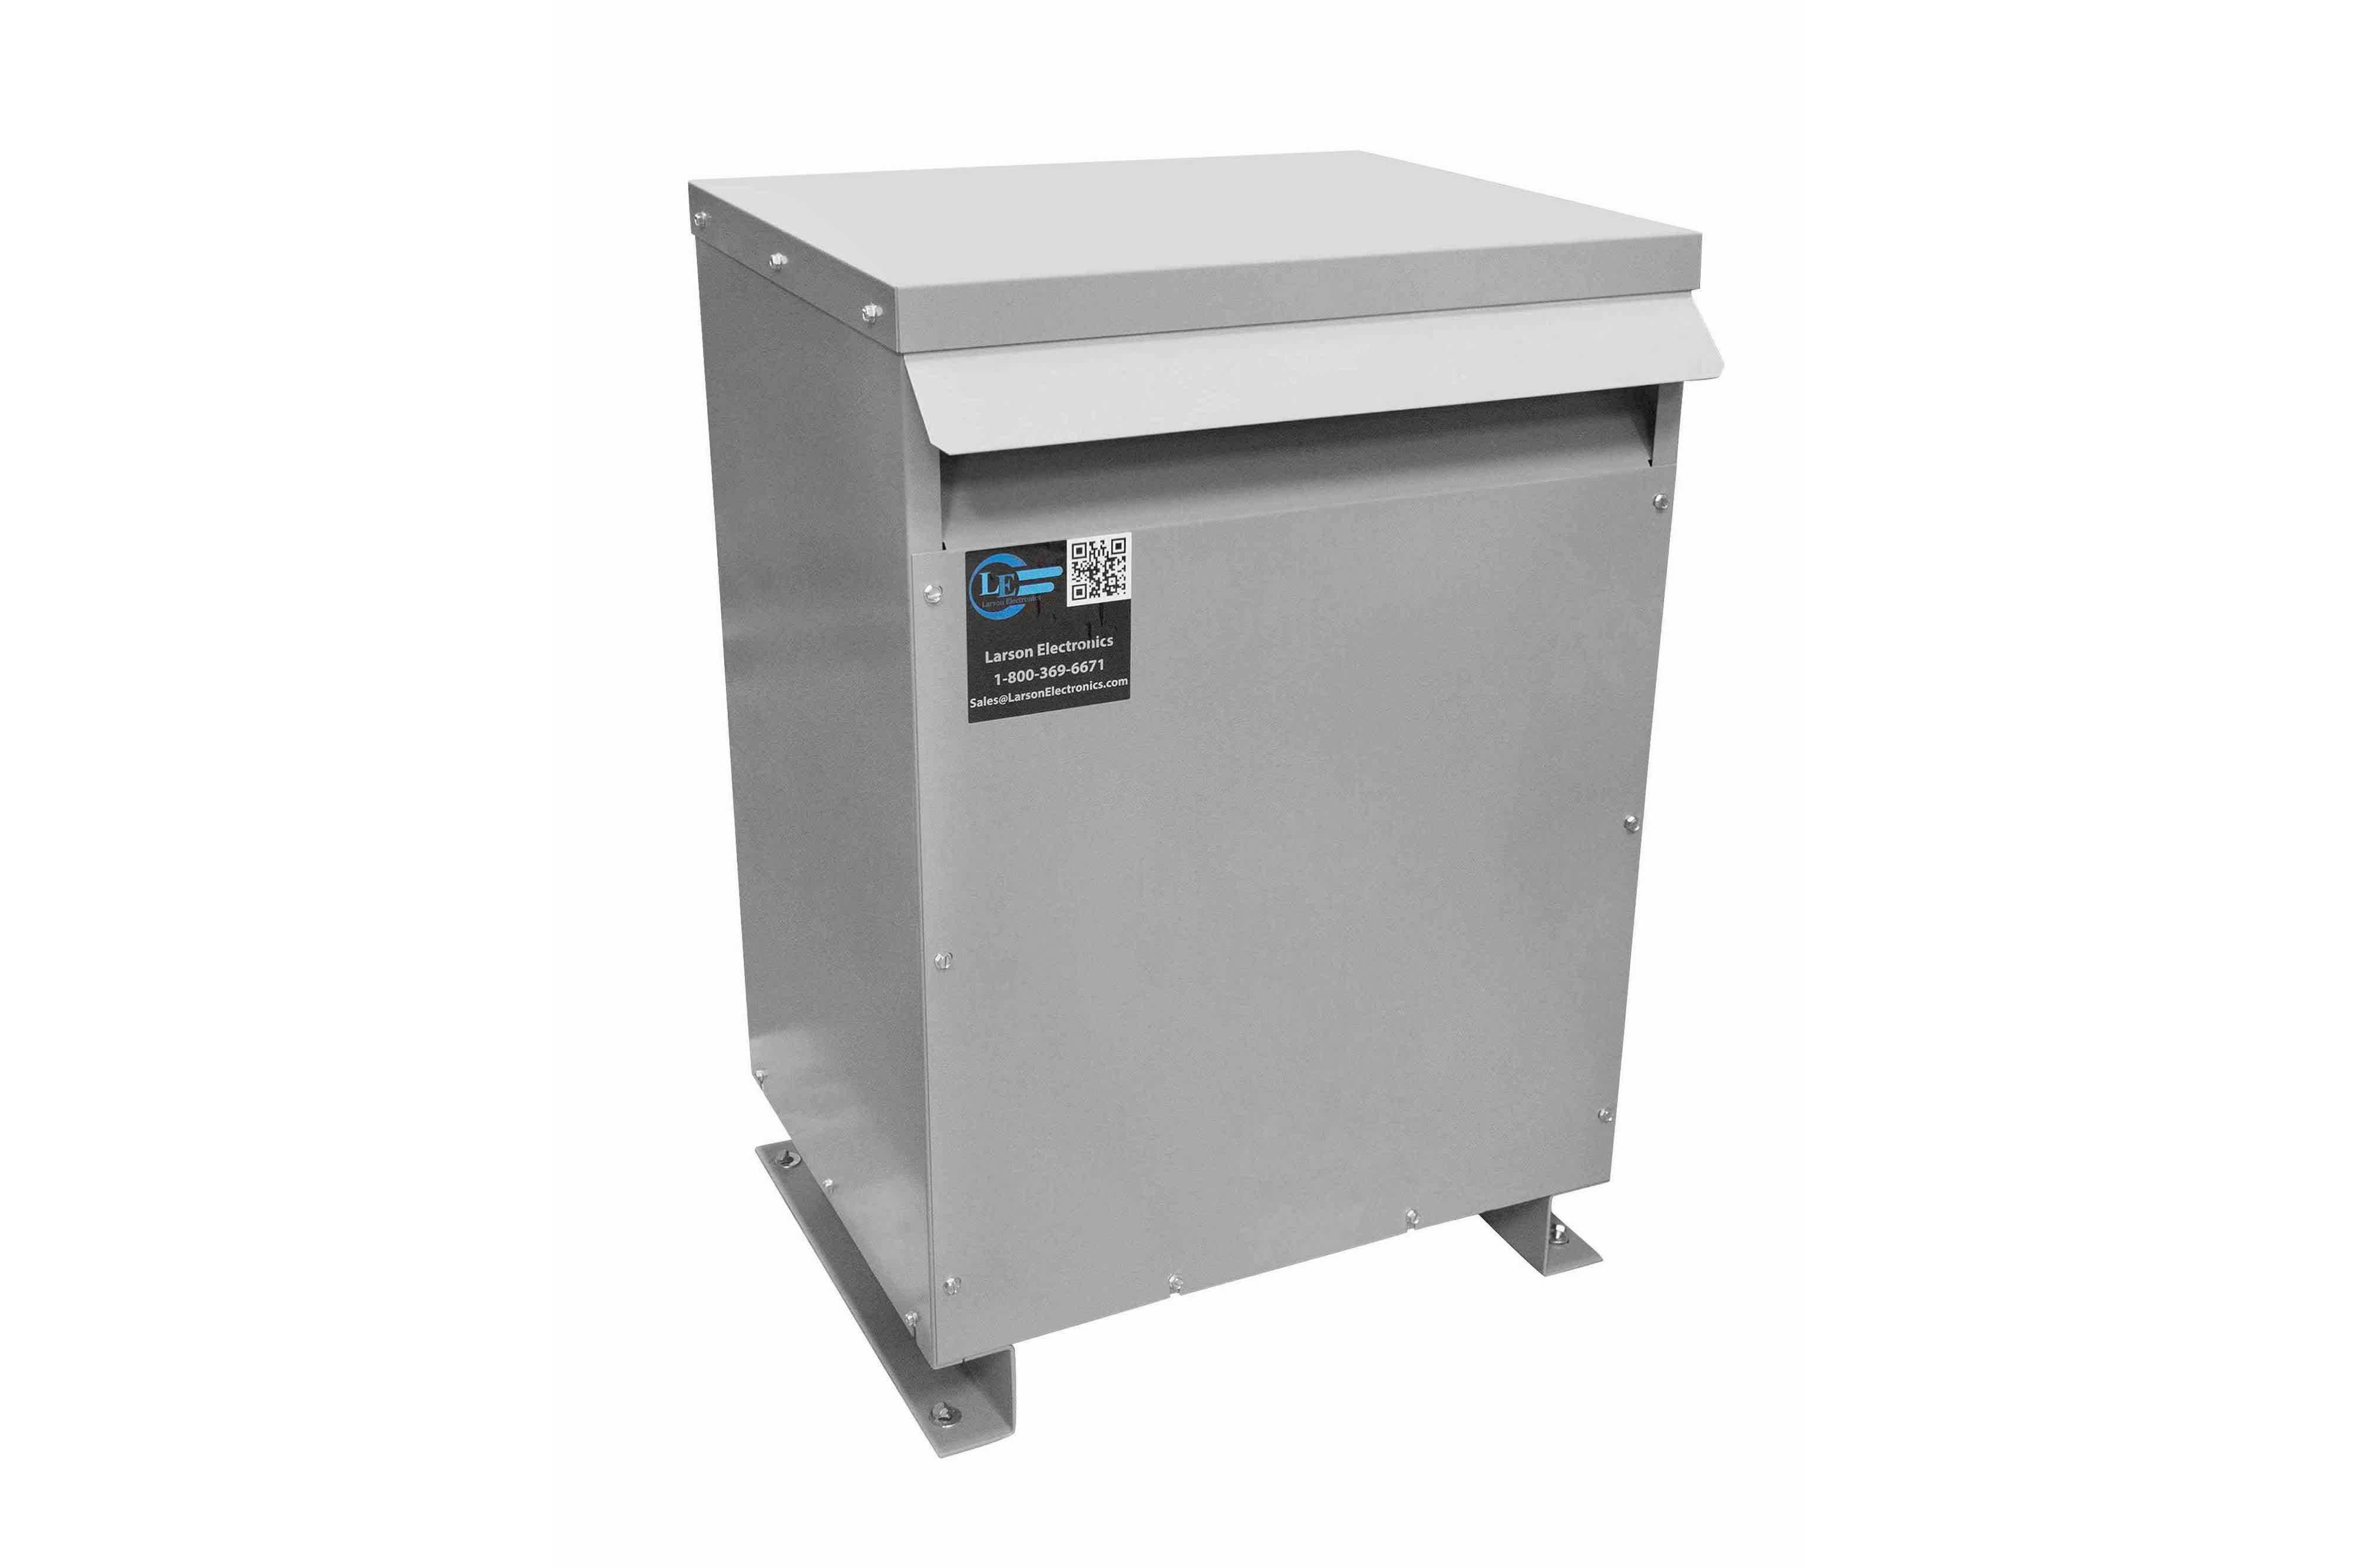 75 kVA 3PH Isolation Transformer, 240V Wye Primary, 380Y/220 Wye-N Secondary, N3R, Ventilated, 60 Hz